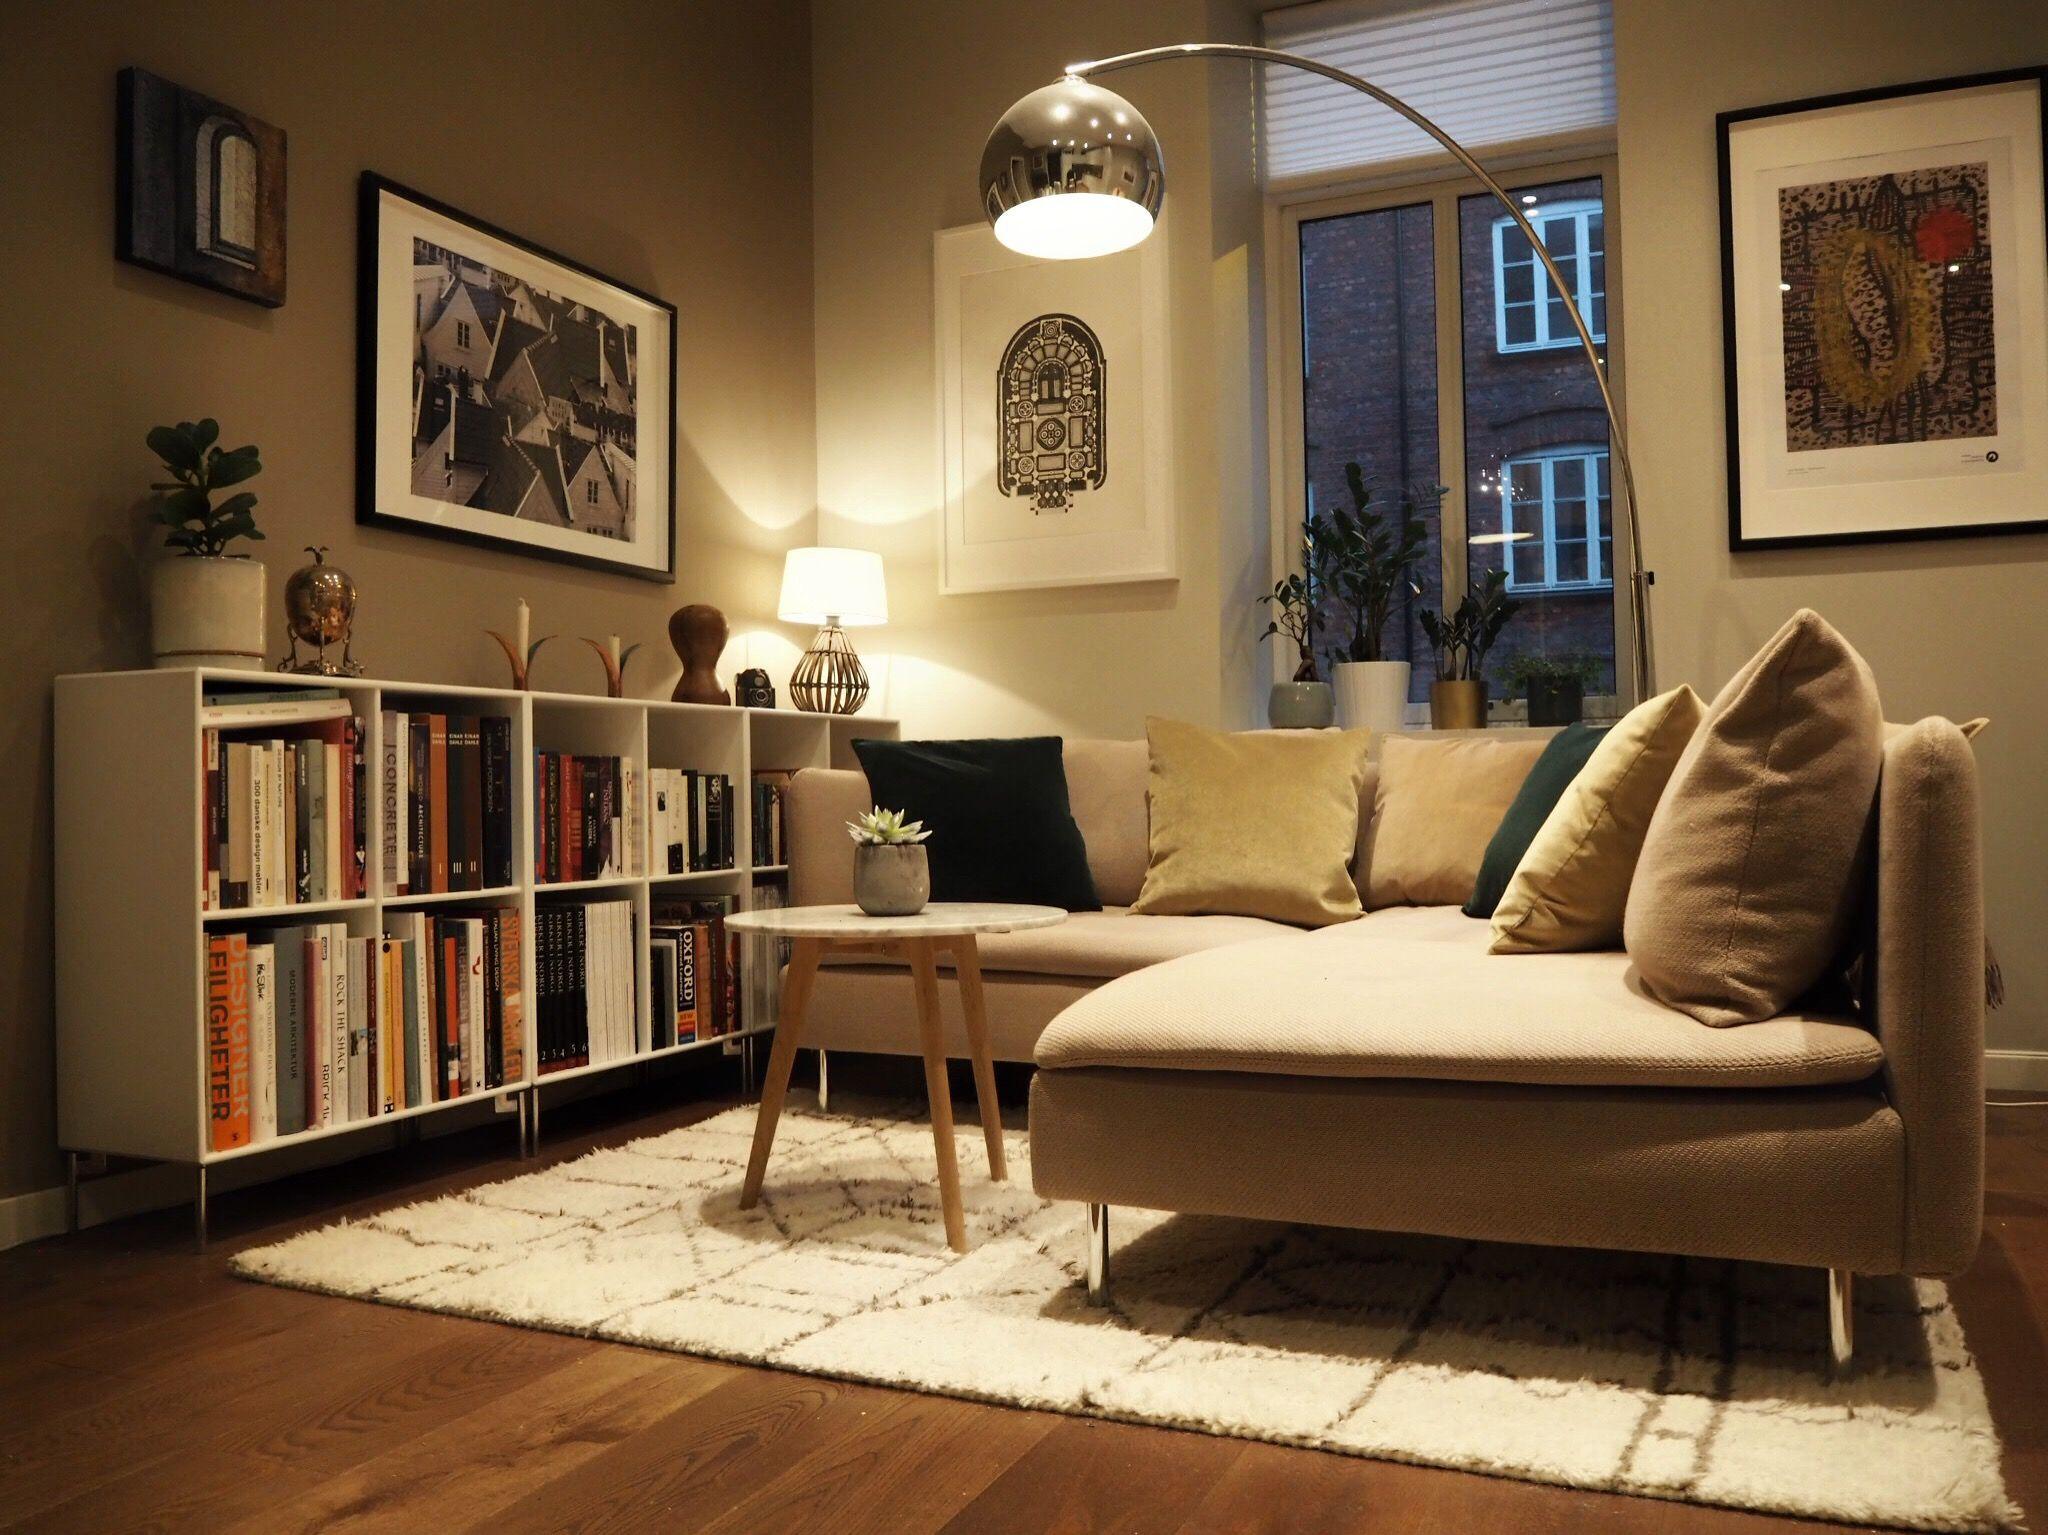 Student apartment living room - Architecture Student Apartment Home Love Interior Design Livingroom Montana Furniture Soderhamn Sofa Marble Art Bergen Oslo